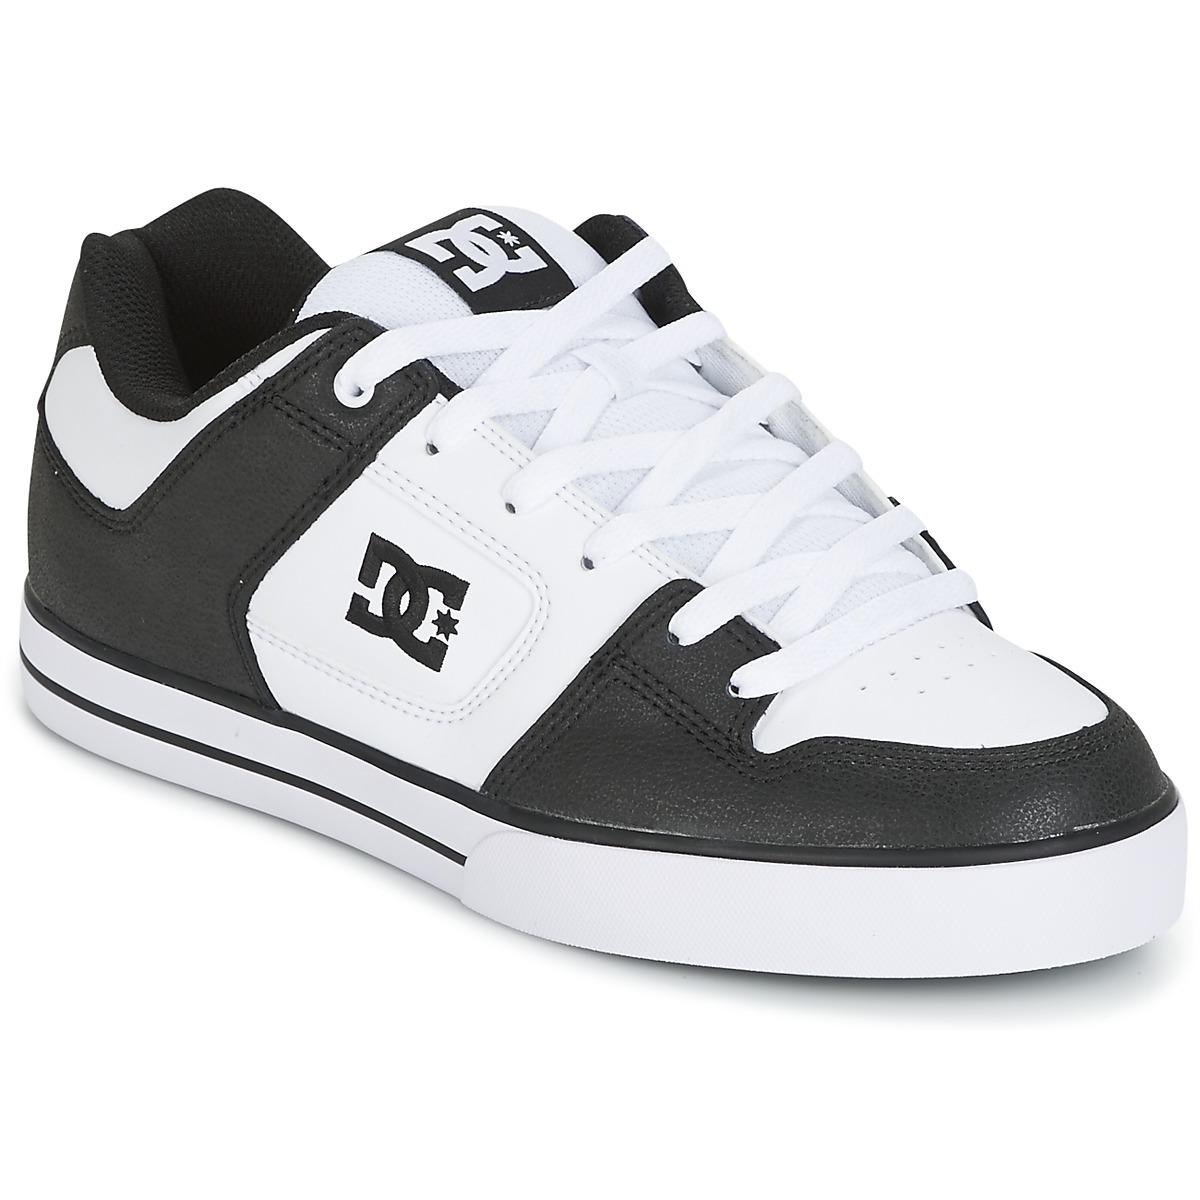 dc shoes pure men 39 s skate shoes trainers in black in black for men lyst. Black Bedroom Furniture Sets. Home Design Ideas